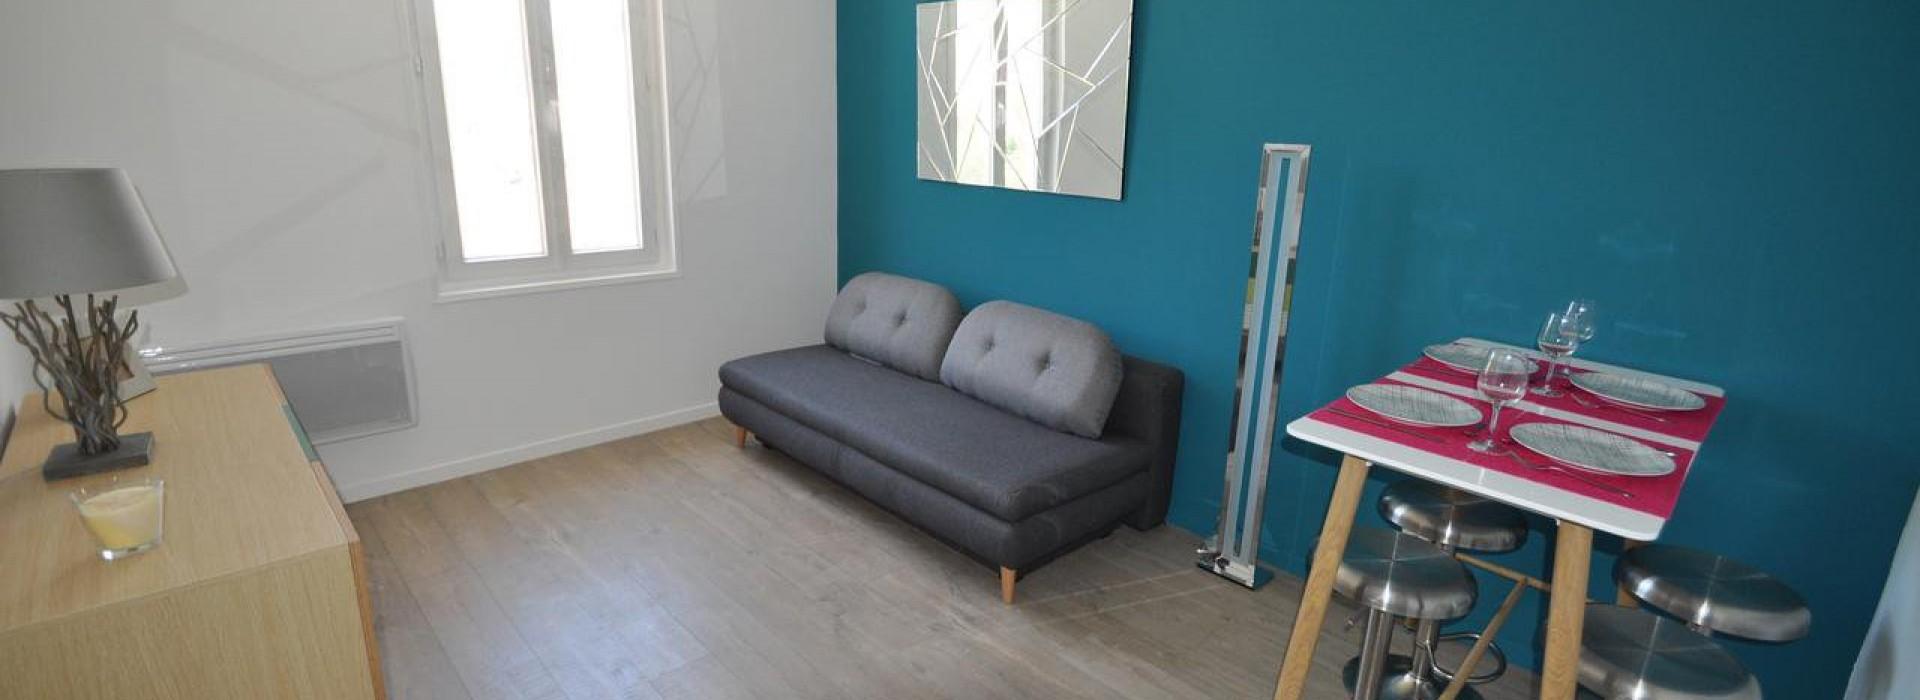 Appartement Nice 1 Pièce 22m2 139,000€